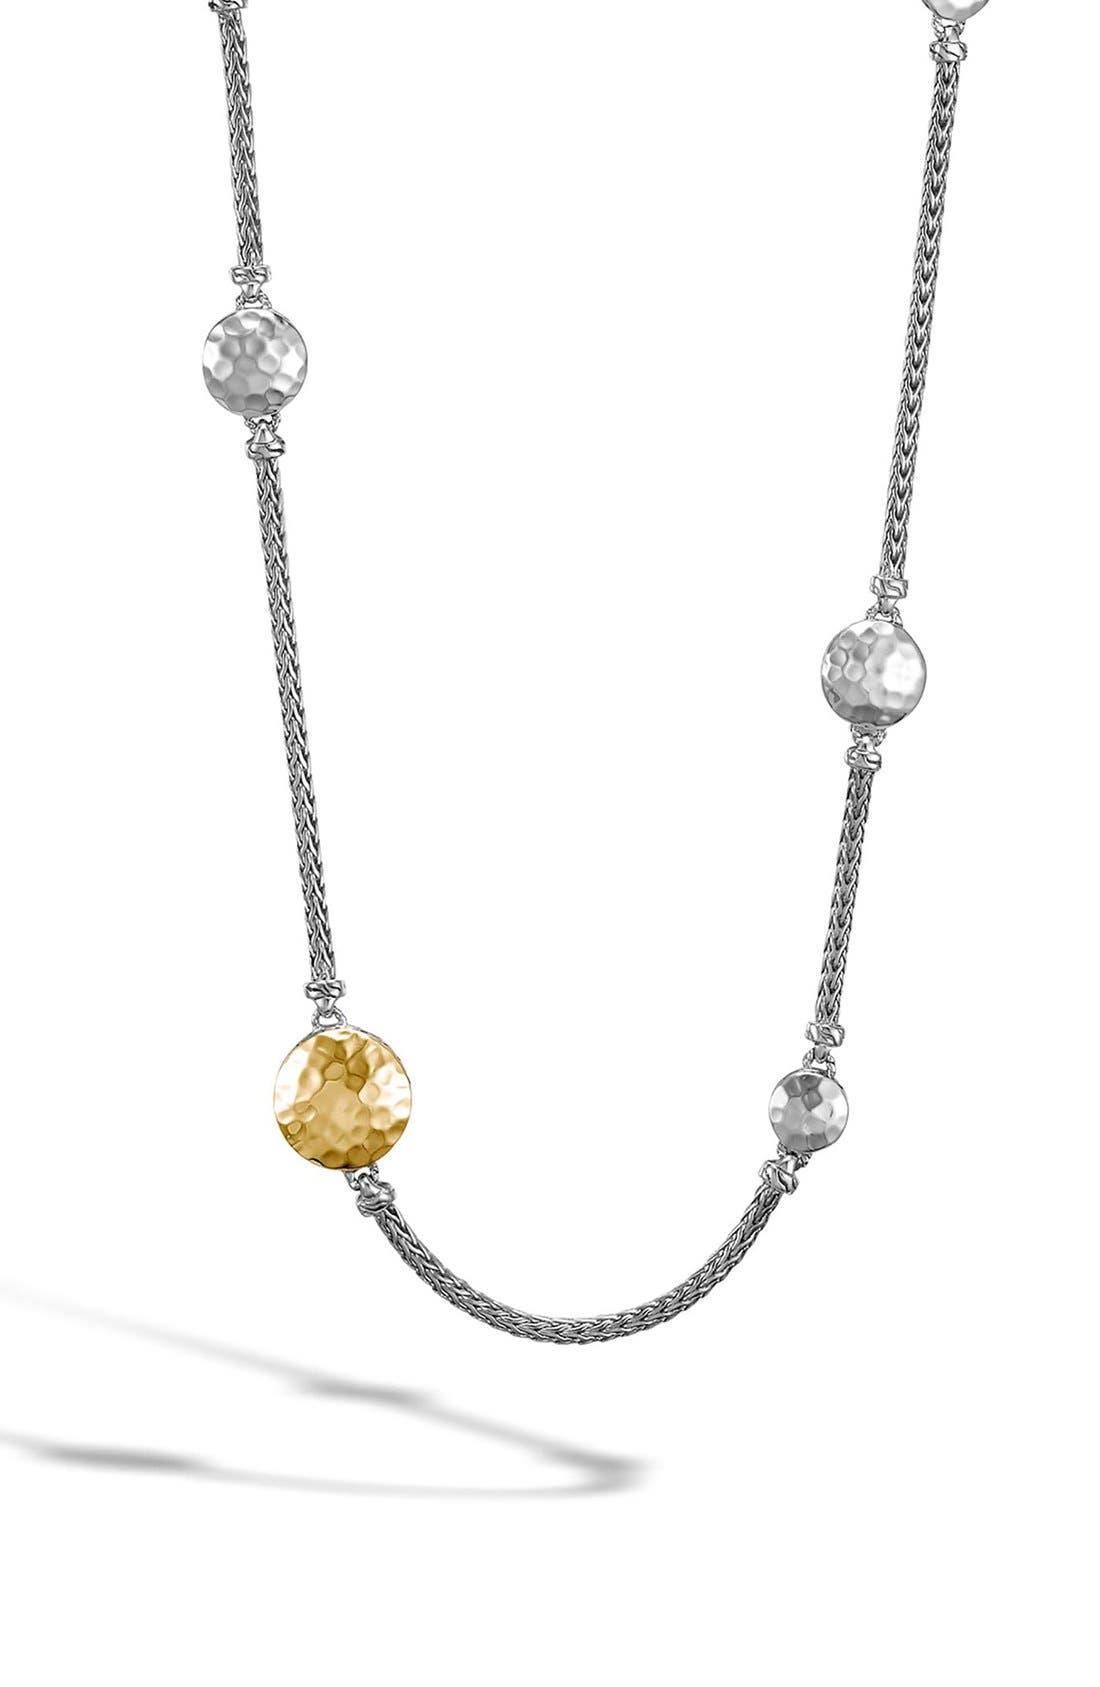 Main Image - John Hardy 'Dot' Long Station Necklace